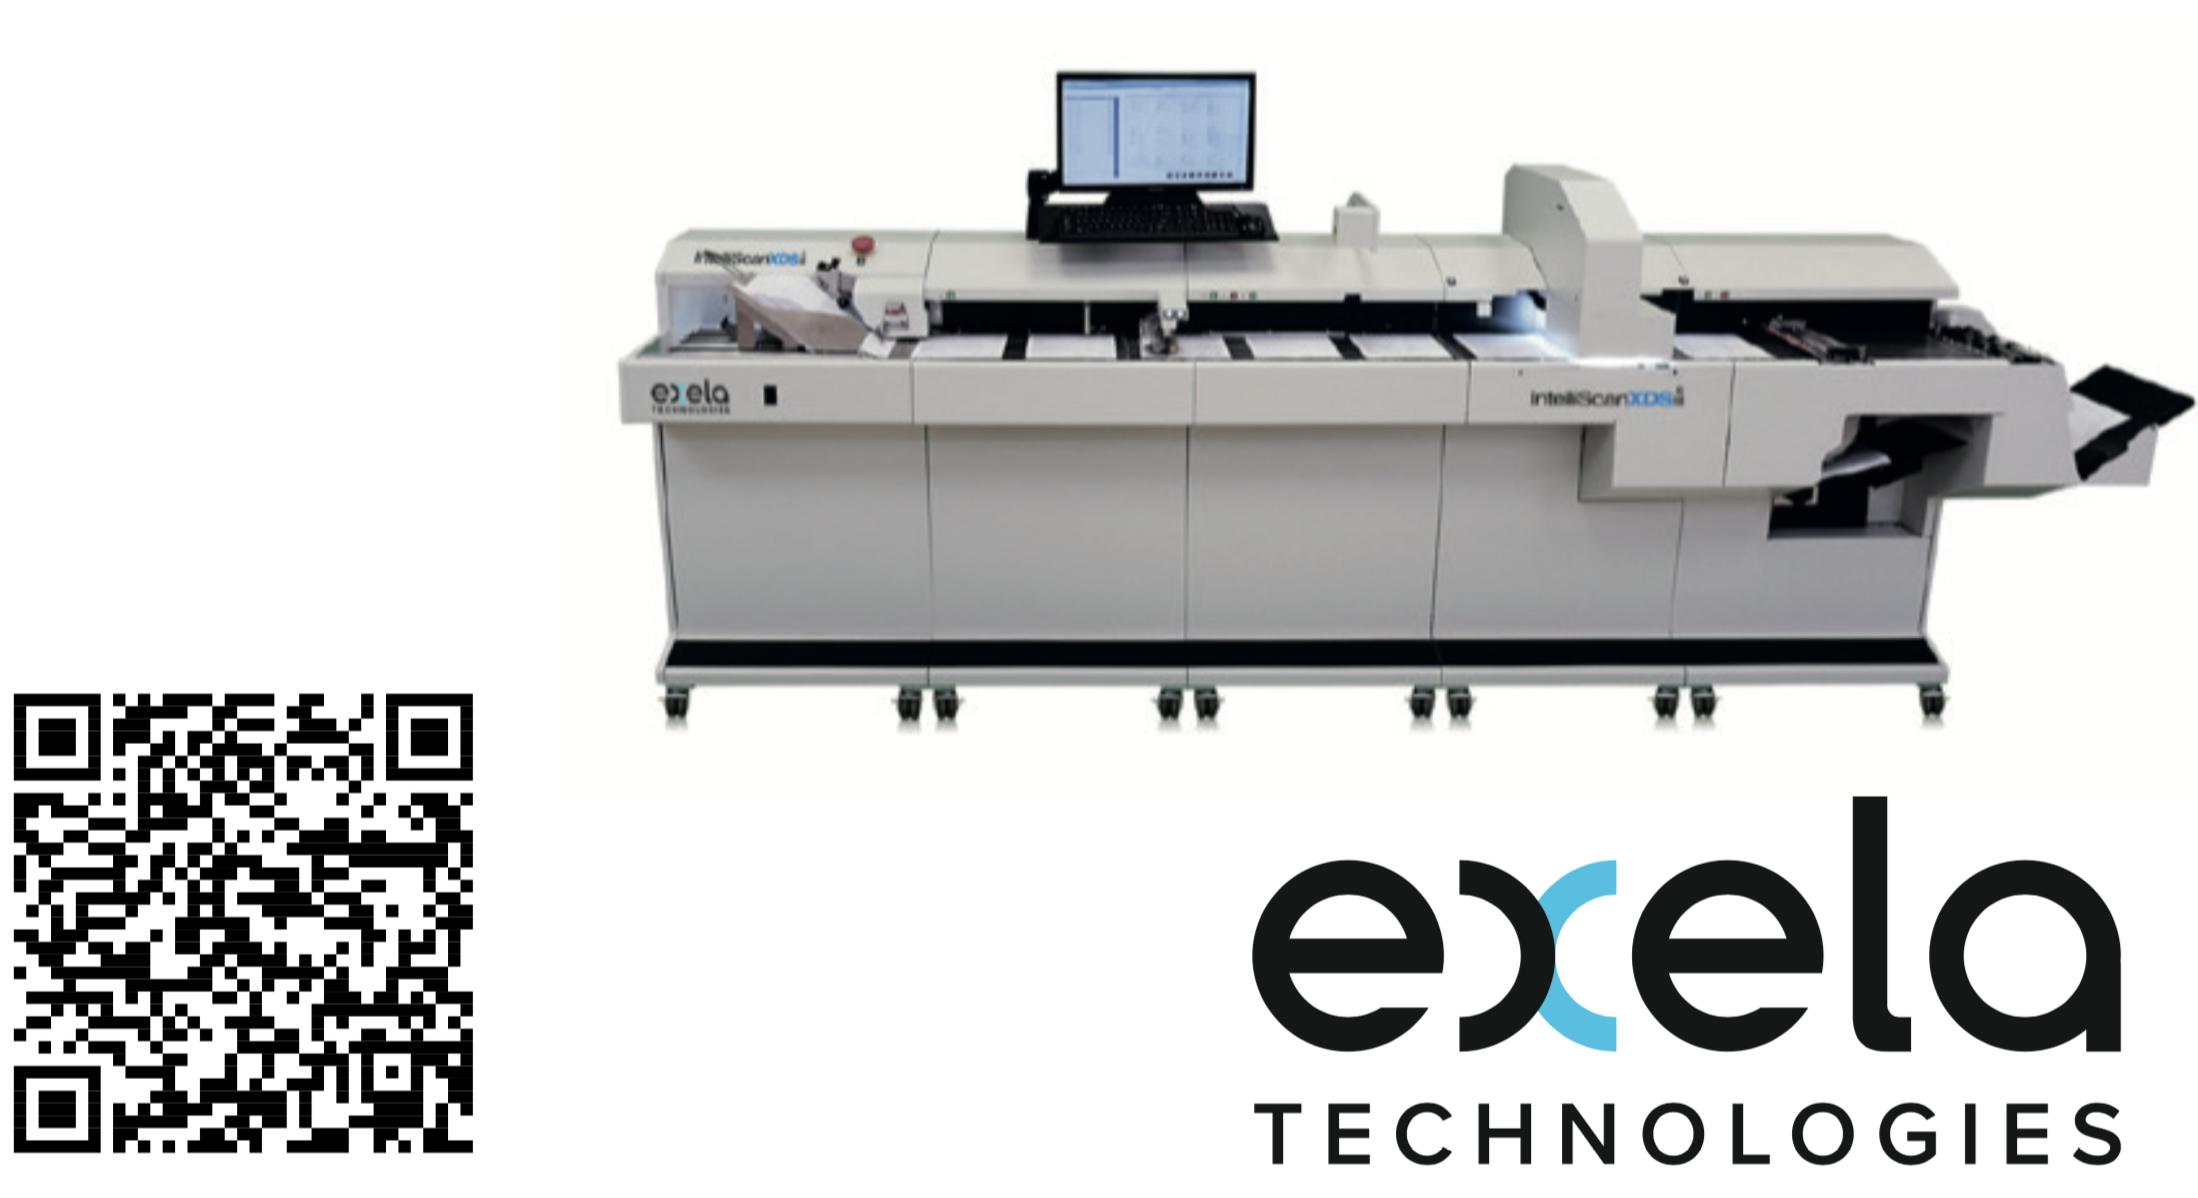 Exela Technologies IntelliScan XDS 5